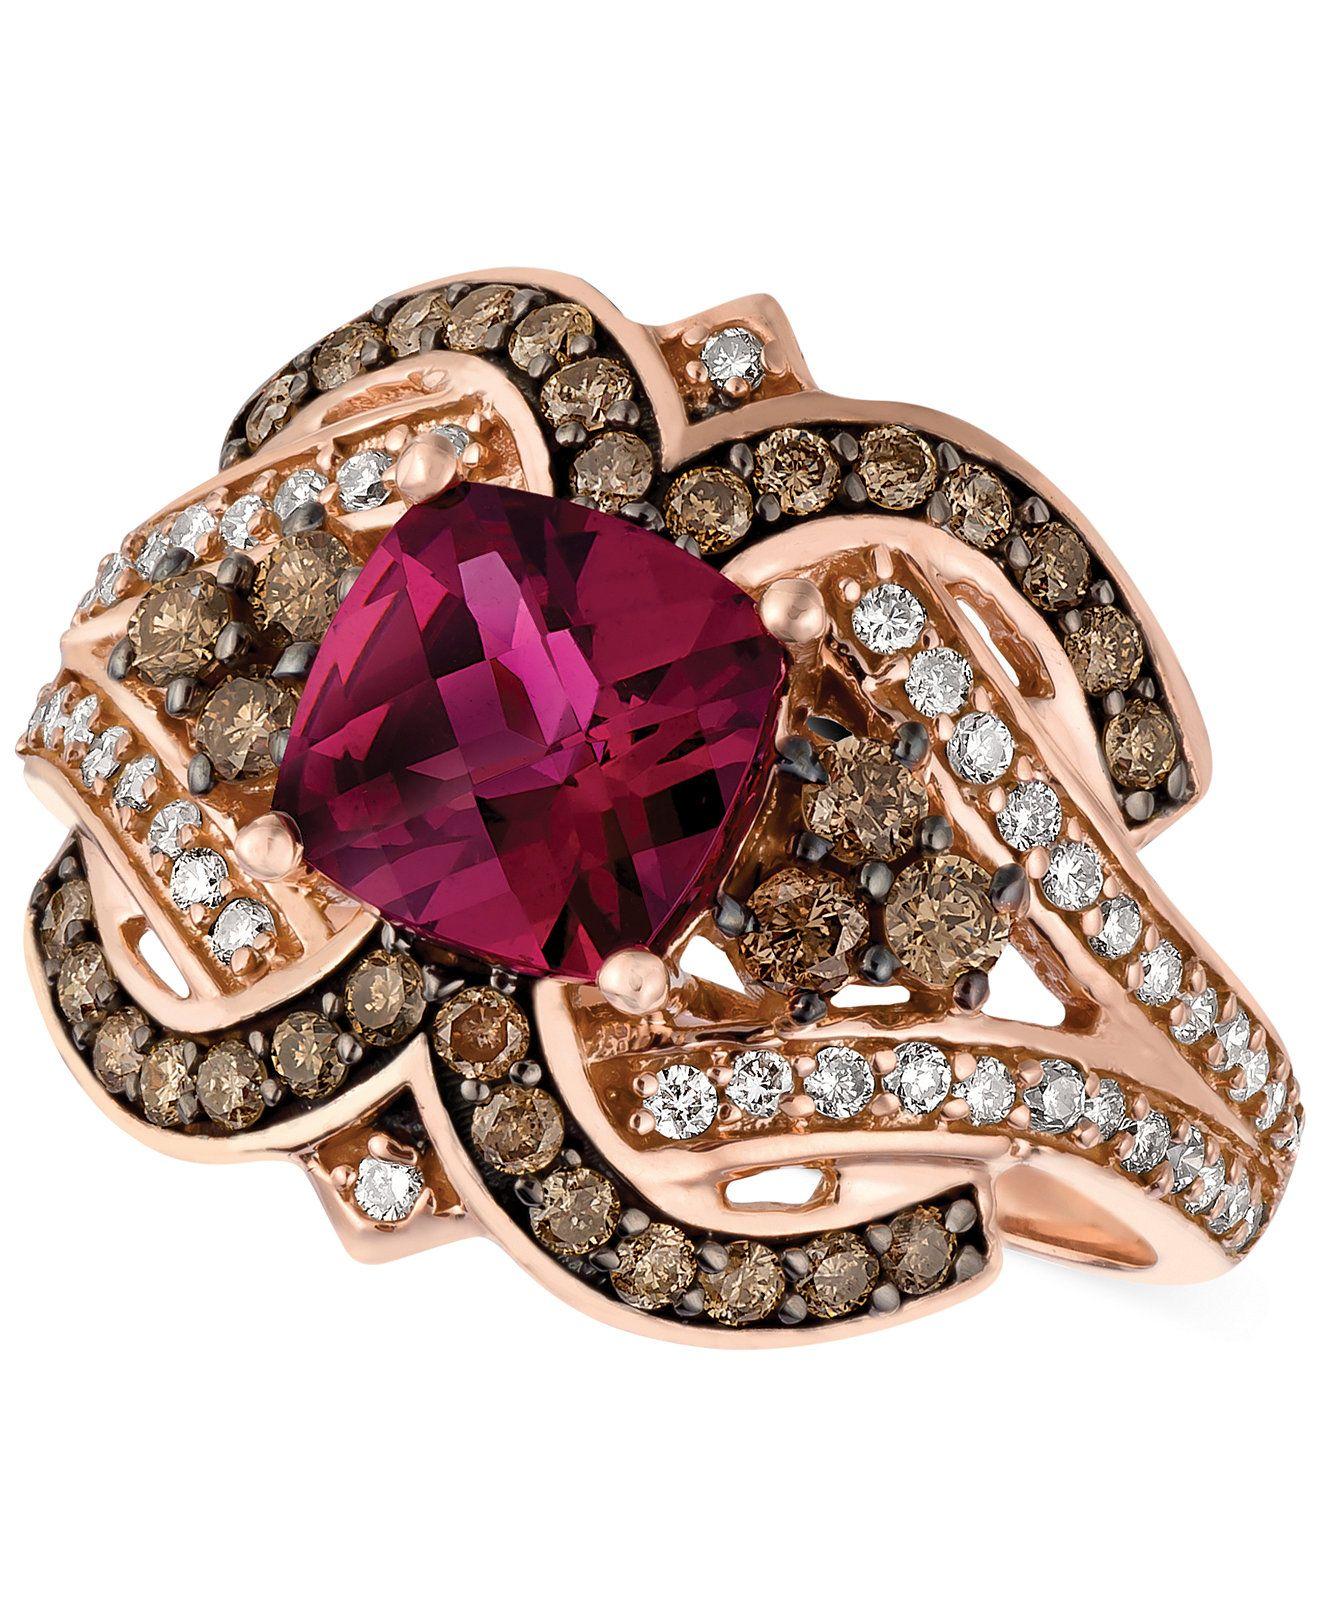 Le Vian Raspberry Rholodite Garnet 1 3 4 ct t w and Diamond 1